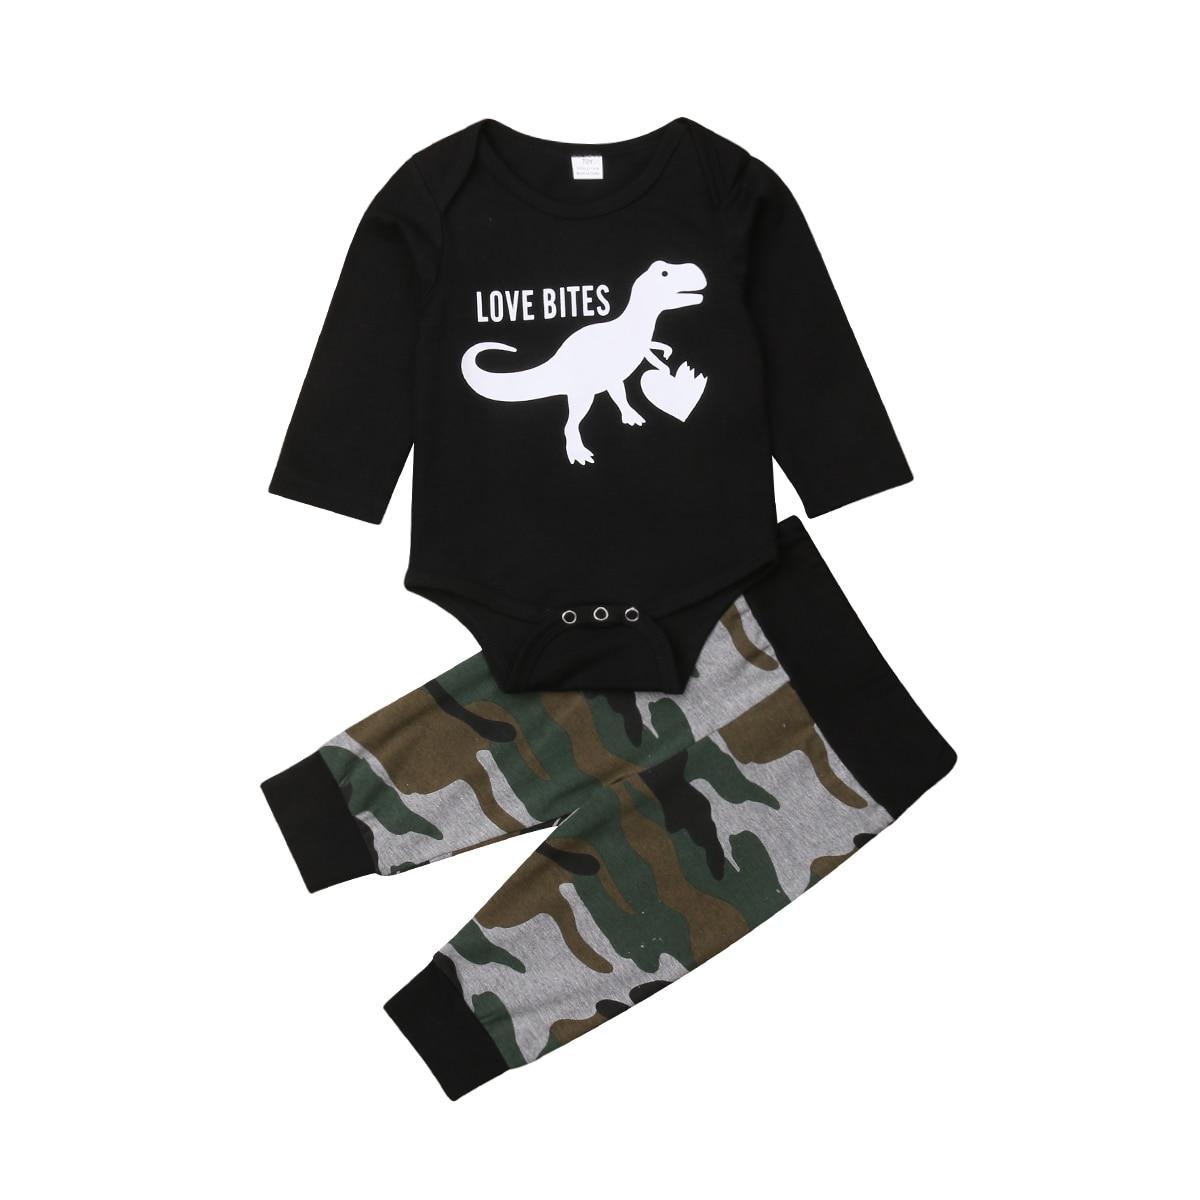 0-12 Mt Neugeborenen Baby Boy Langarm Dinosaurier Strampler Tops + Camouflage Lange Hose 2 Stücke Outfits Jungen Kleidung Set Senility VerzöGern